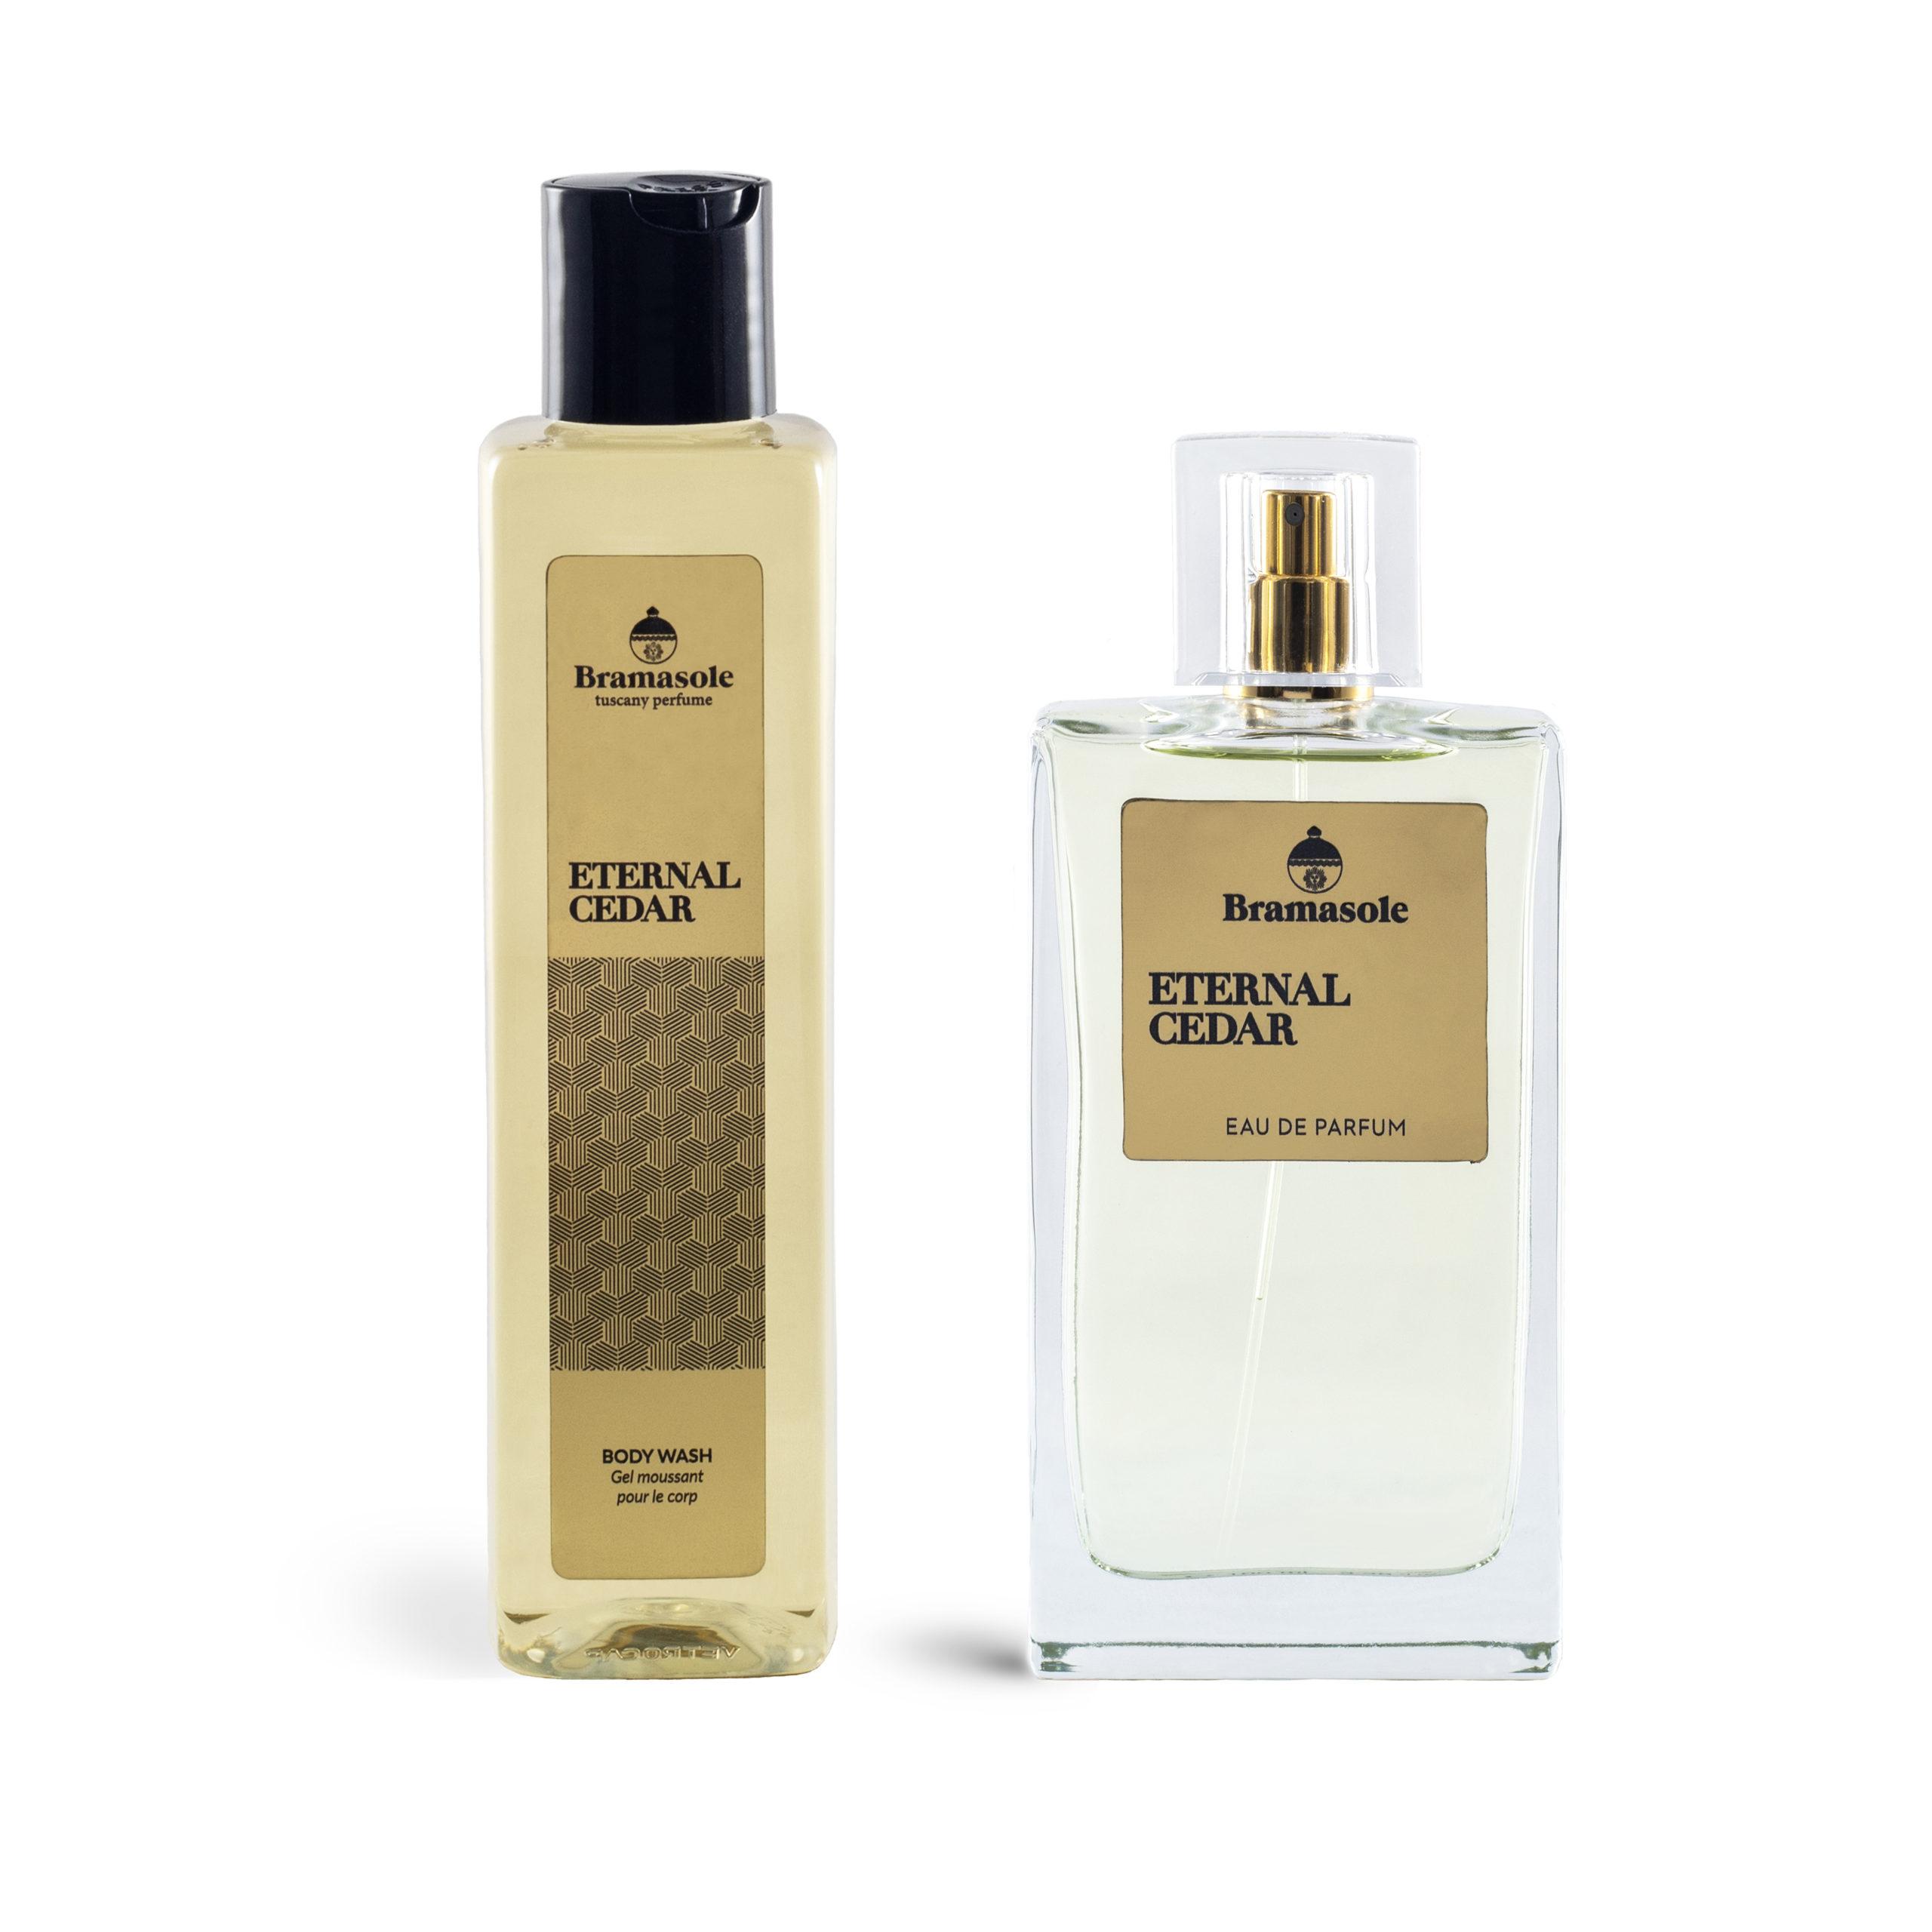 Eternal Cedar - profumo e bagnoschiuma